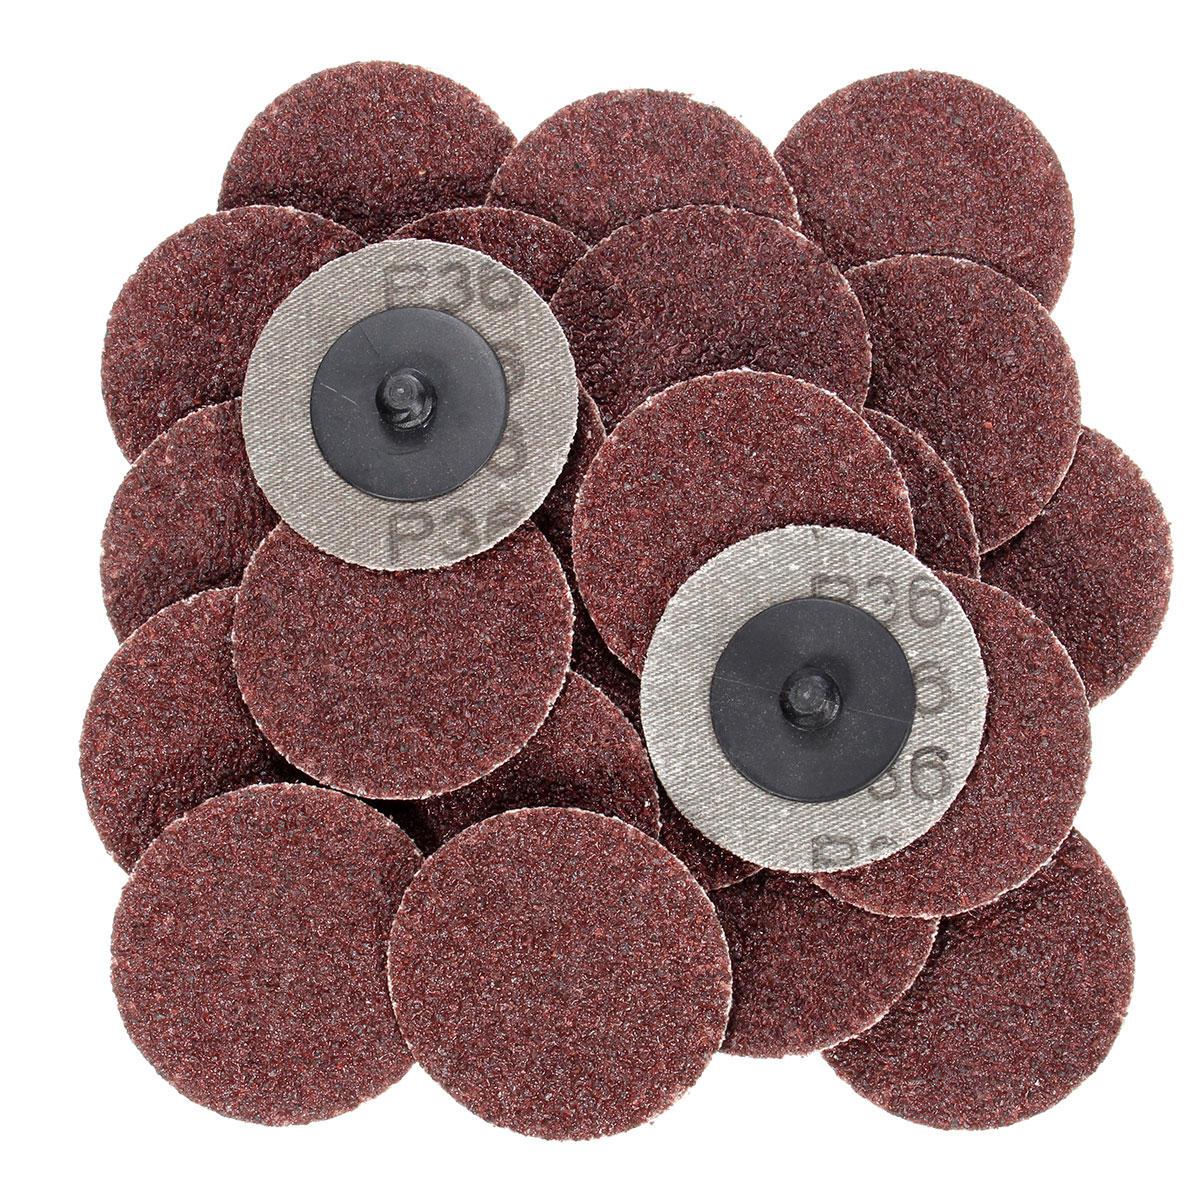 25pcs 2 inch 36 grit r-type abrasive sanding discs roll lock ...